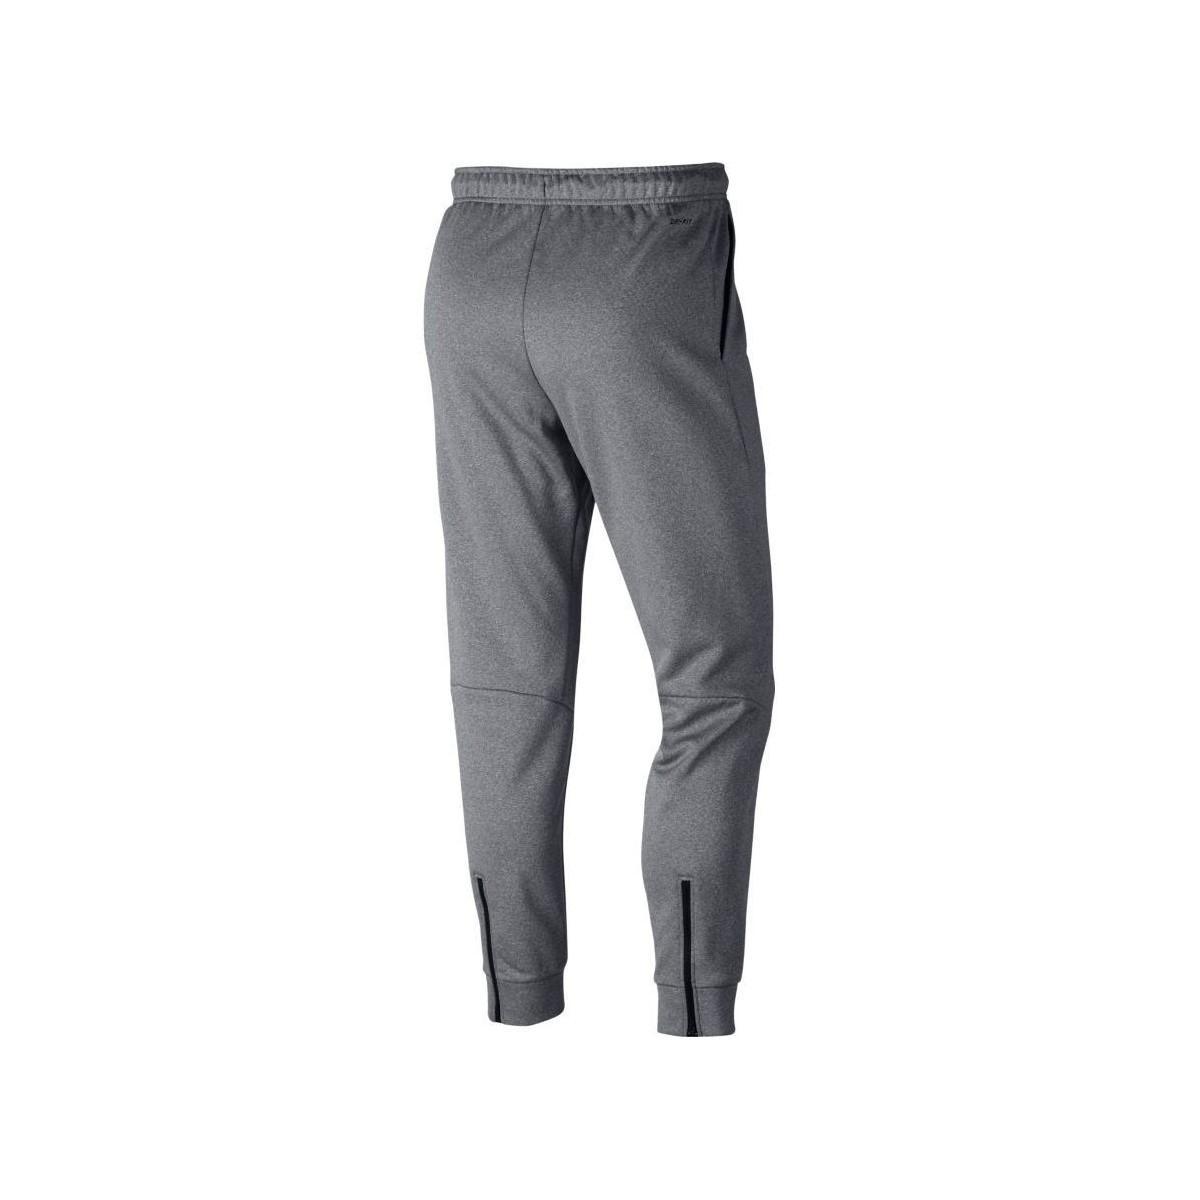 Nike Trainingsbroek Therma Sphere Pant Homme in het Grijs voor heren